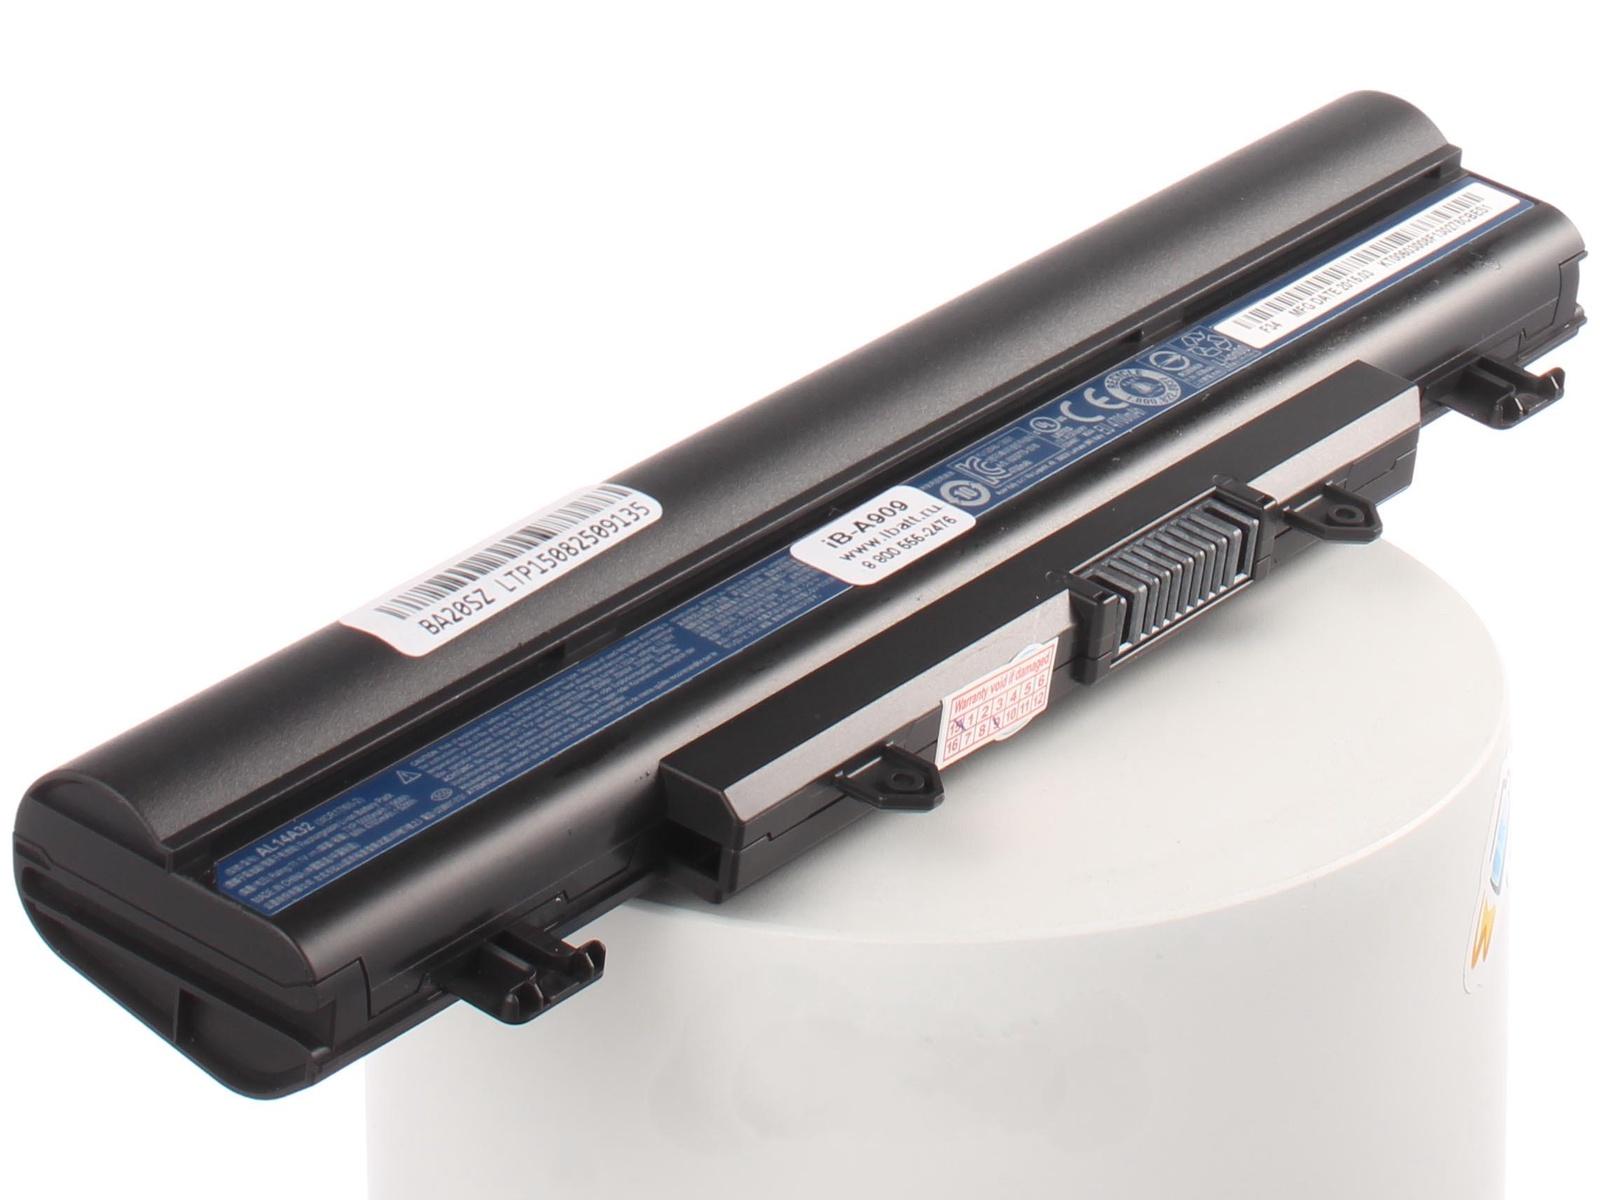 Аккумулятор для ноутбука iBatt для Acer Aspire E5-571G-59VX, TravelMate P256-MG-58WS, Aspire E5-511-P3MT, Aspire E5-571G-30PX, Aspire E5-571G-33R5, Aspire E5-571G-34AE, ASPIRE E5-571G-39YT, Aspire E5-571G-568U acer aspire e5 573 331j